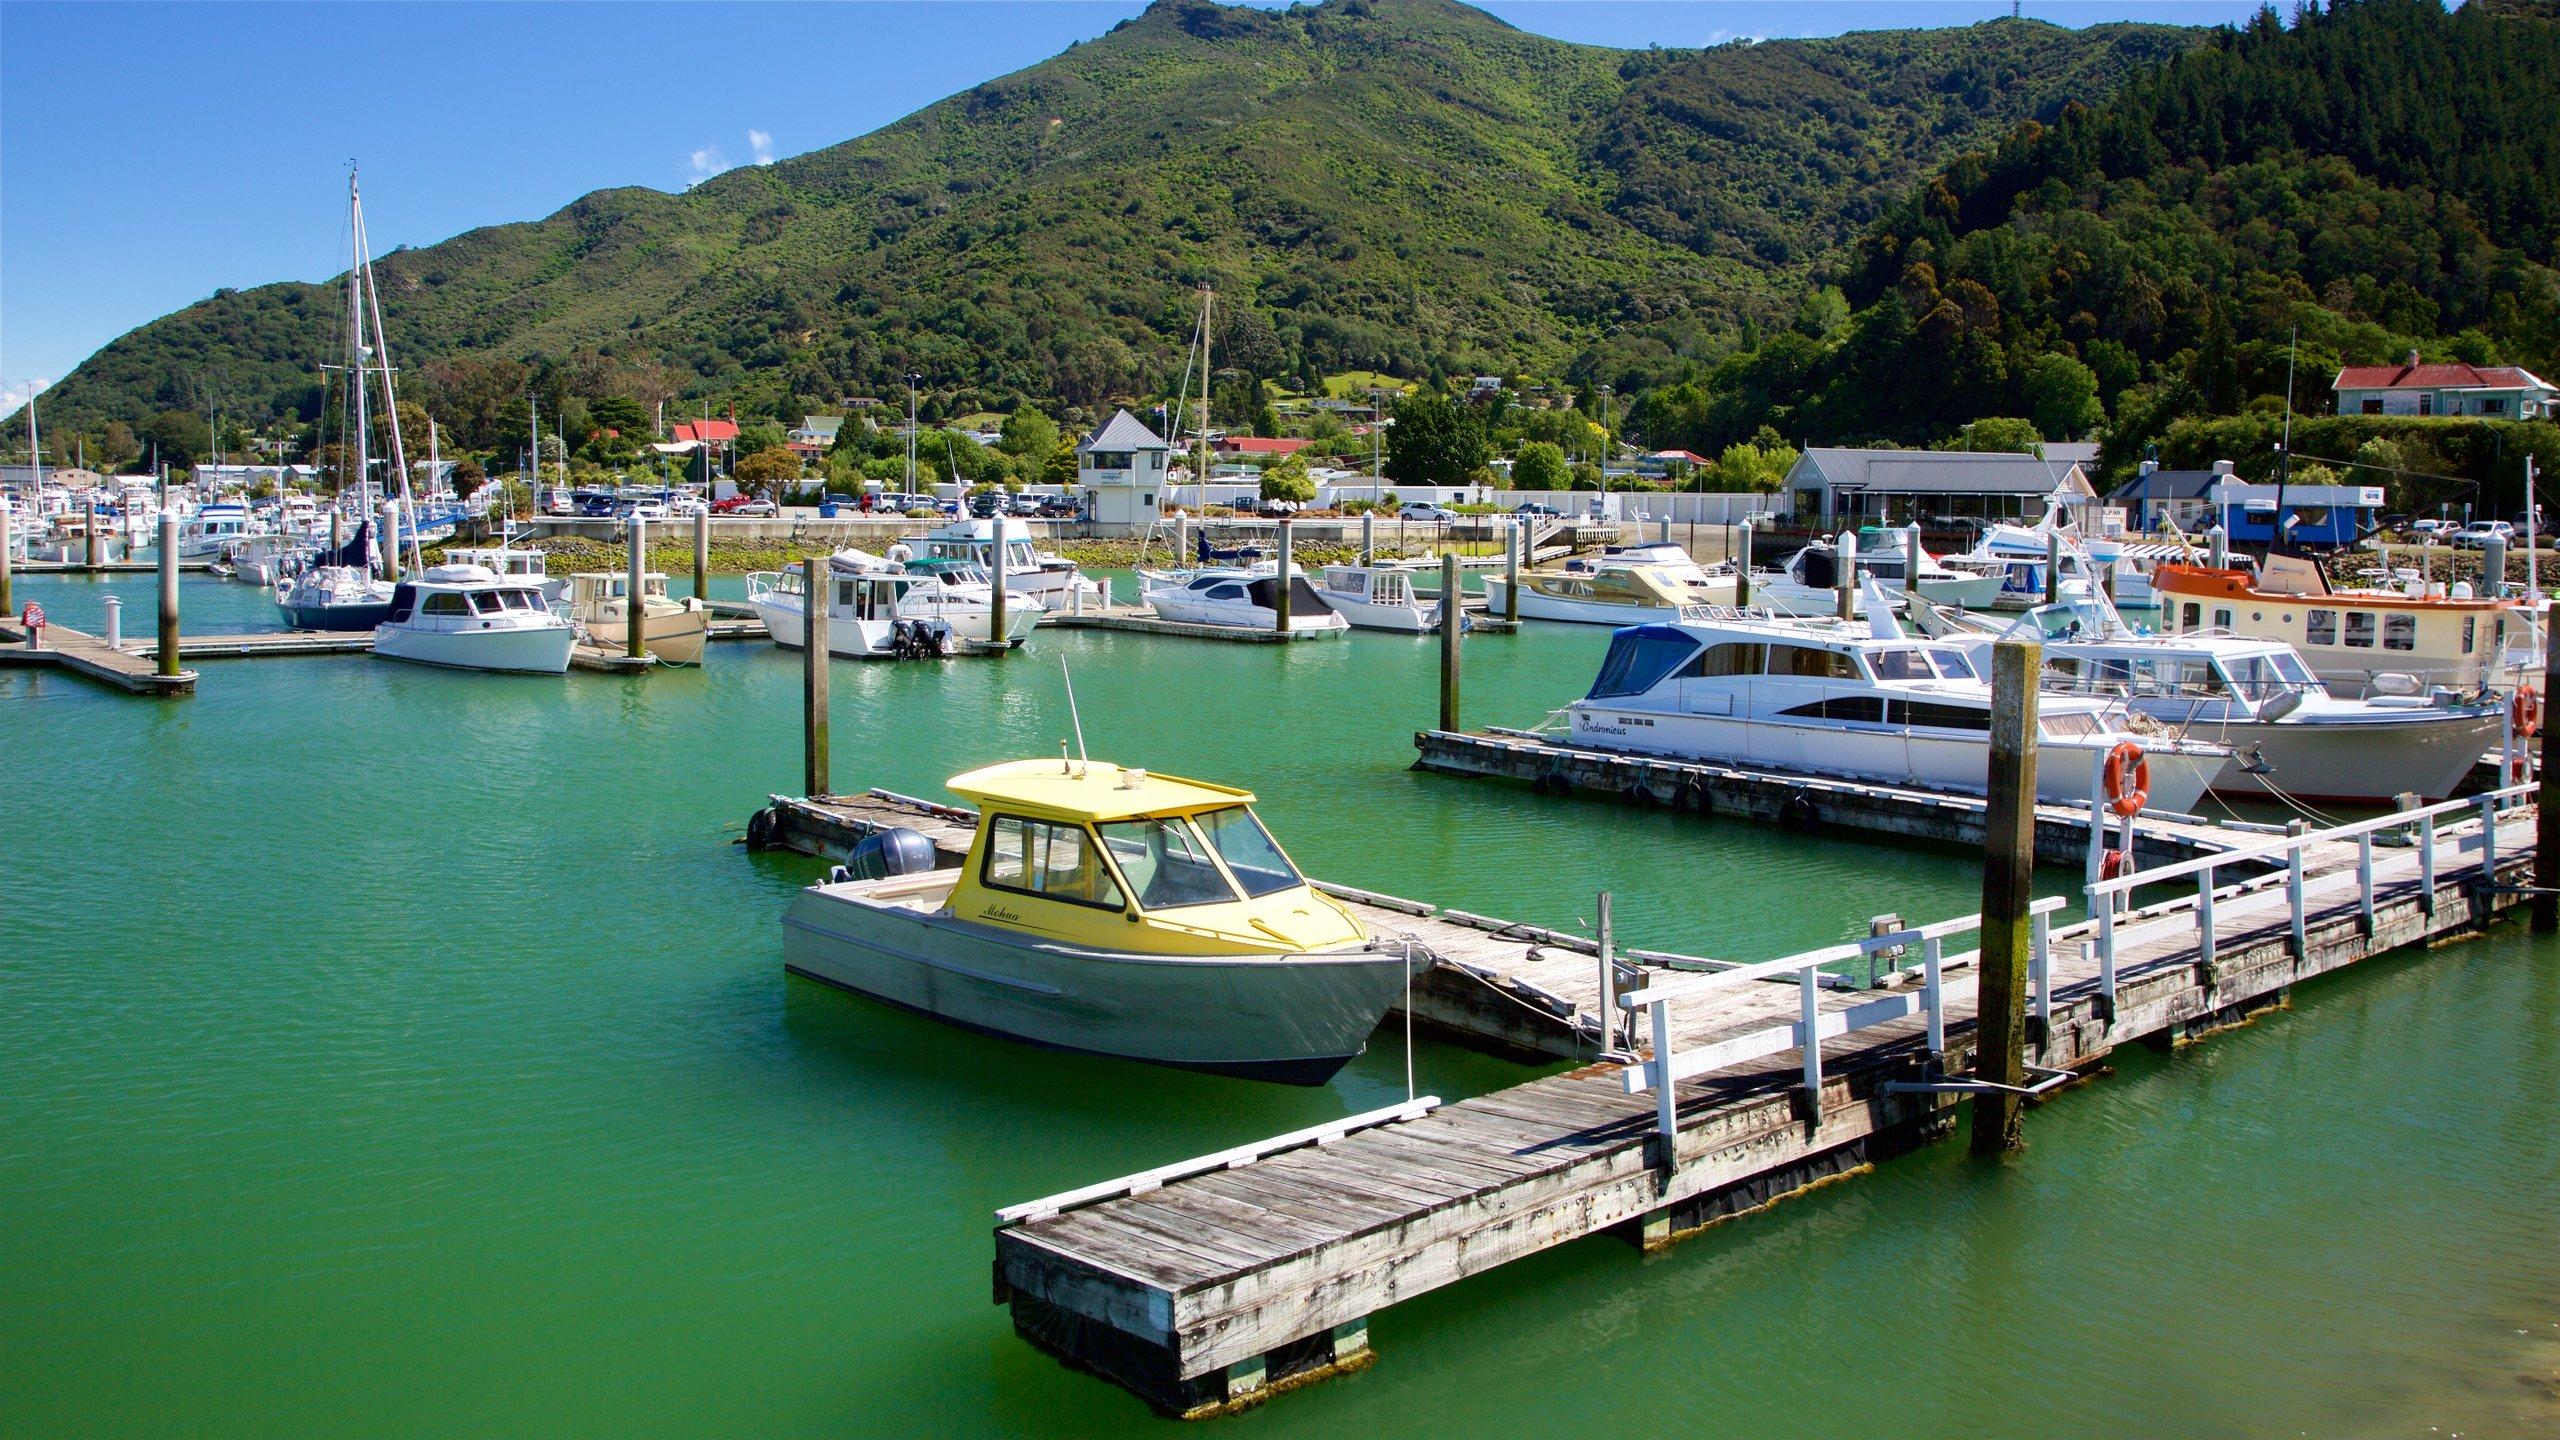 Havelock, Marlborough, New Zealand